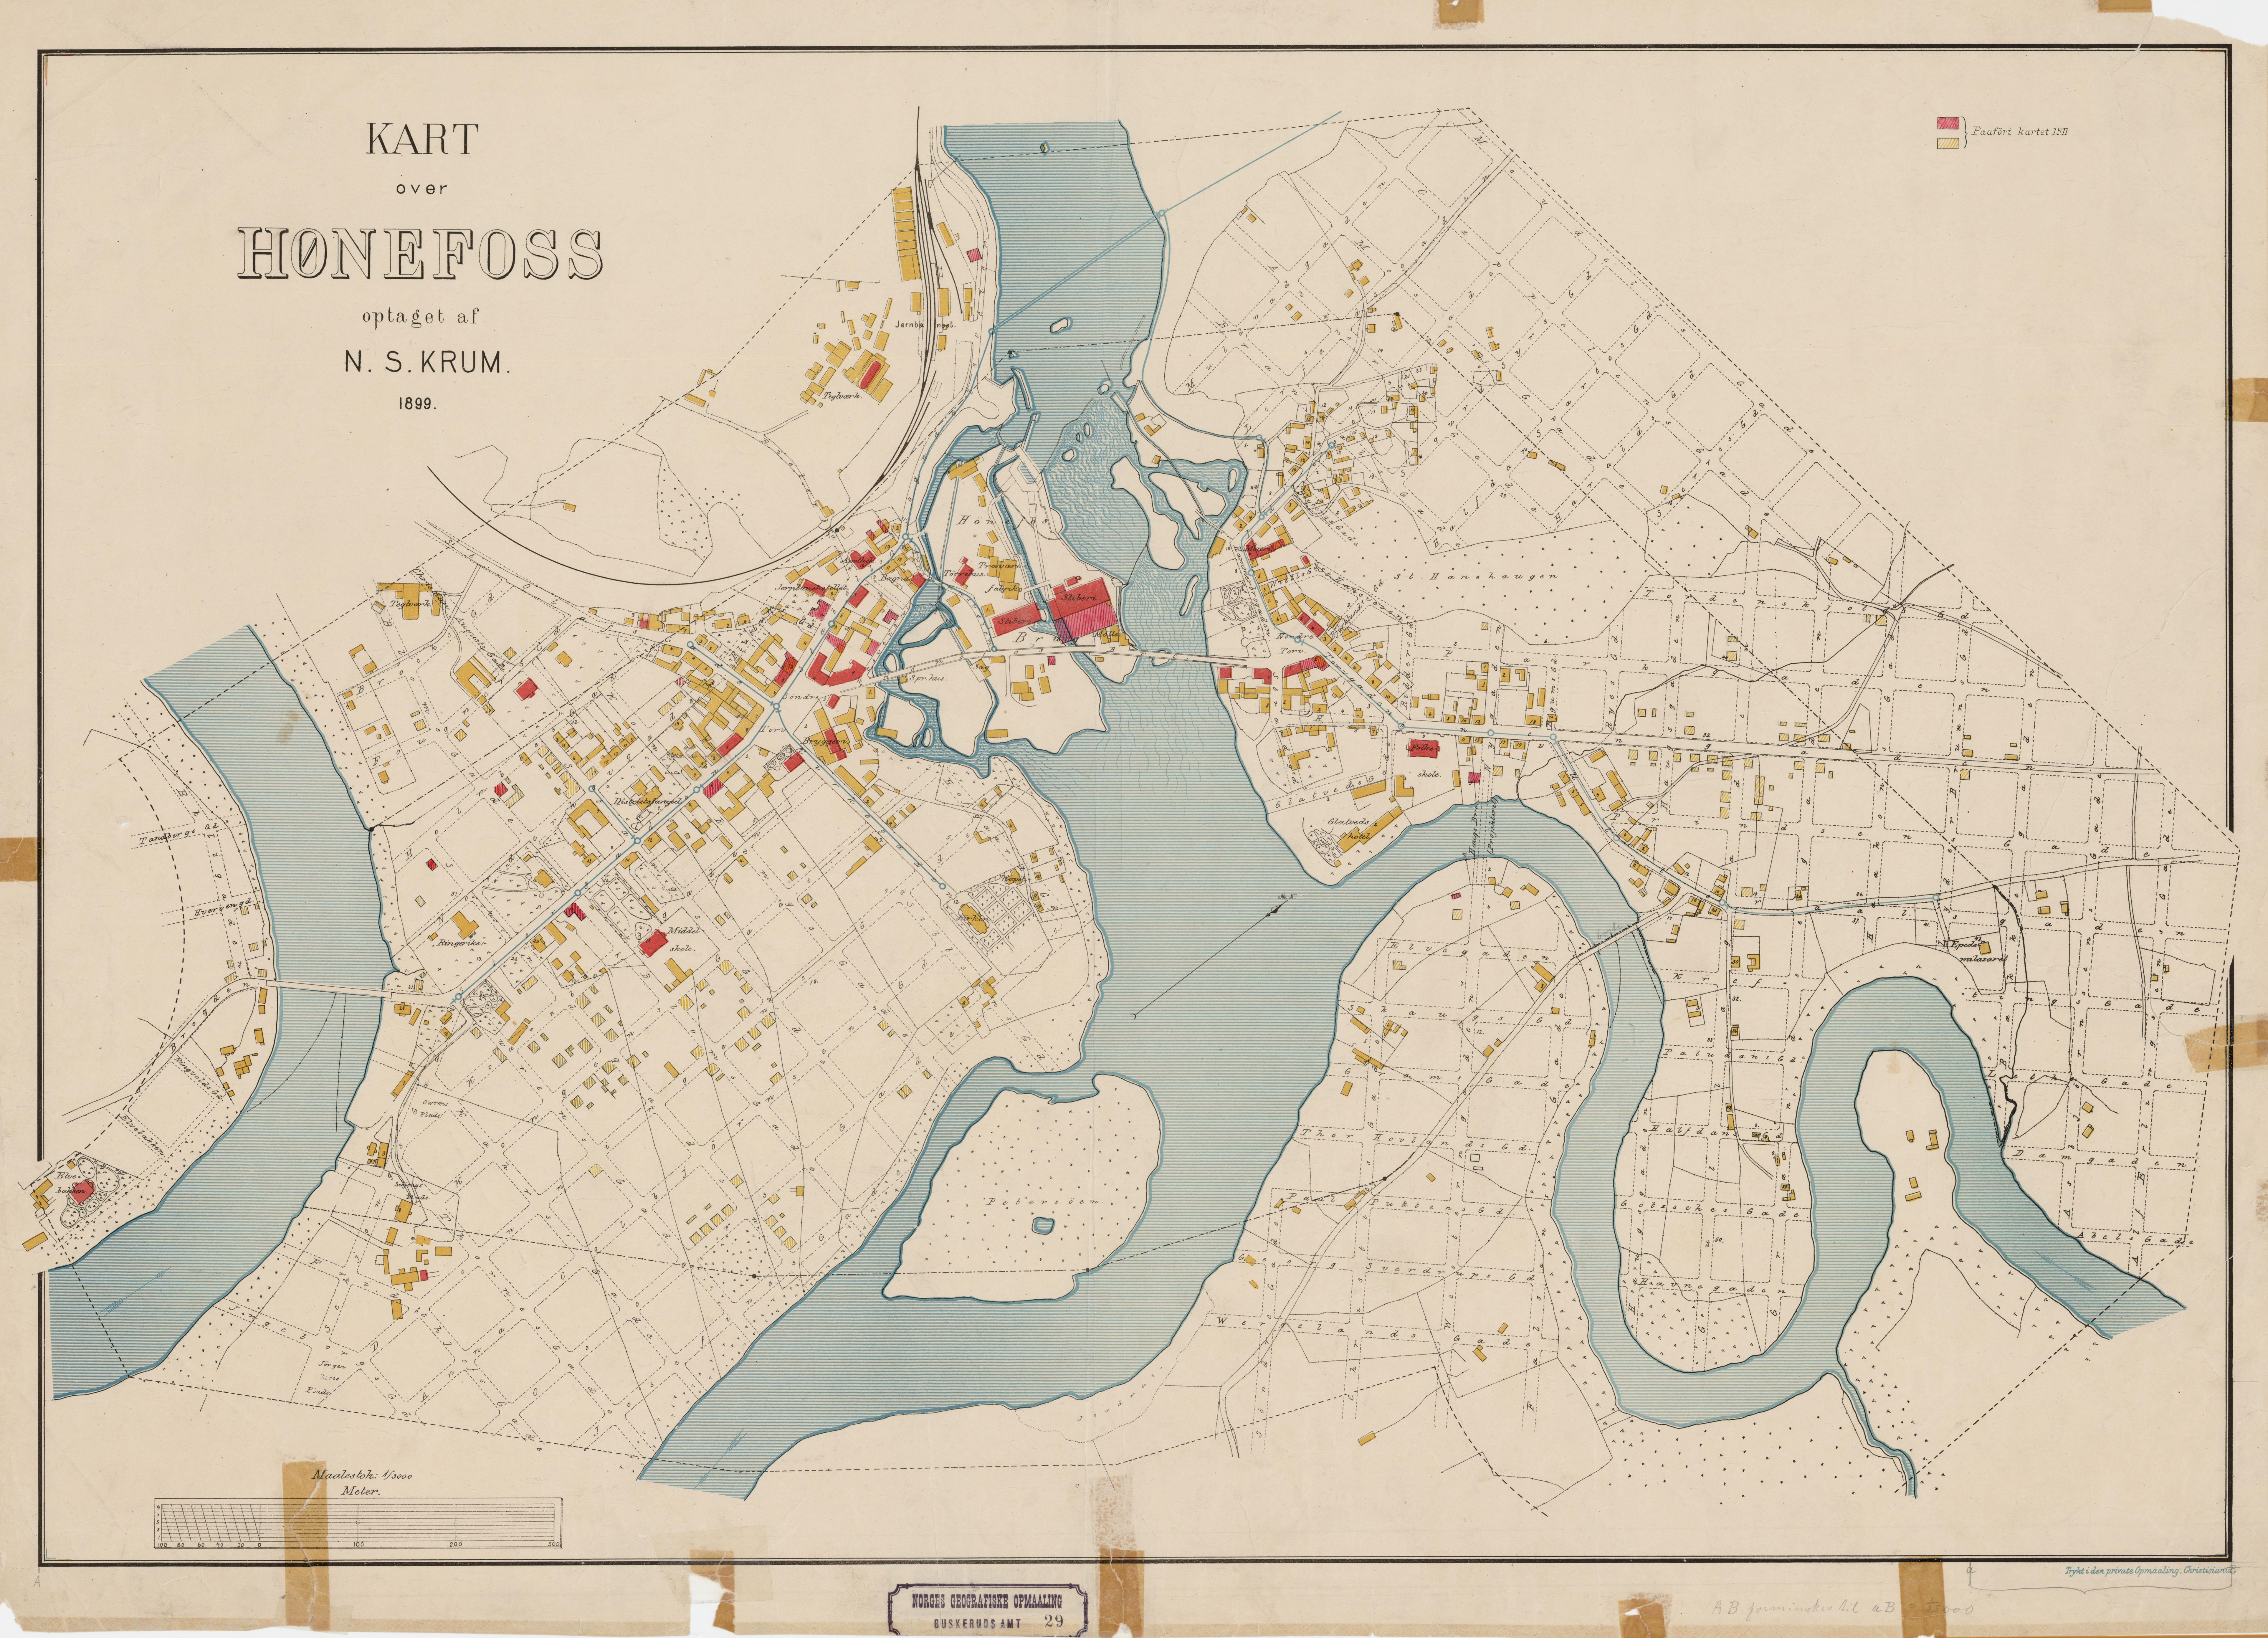 hønefoss kart File:Buskerud amt nr 29  Kart over Hønefoss, 1899.   Wikimedia  hønefoss kart